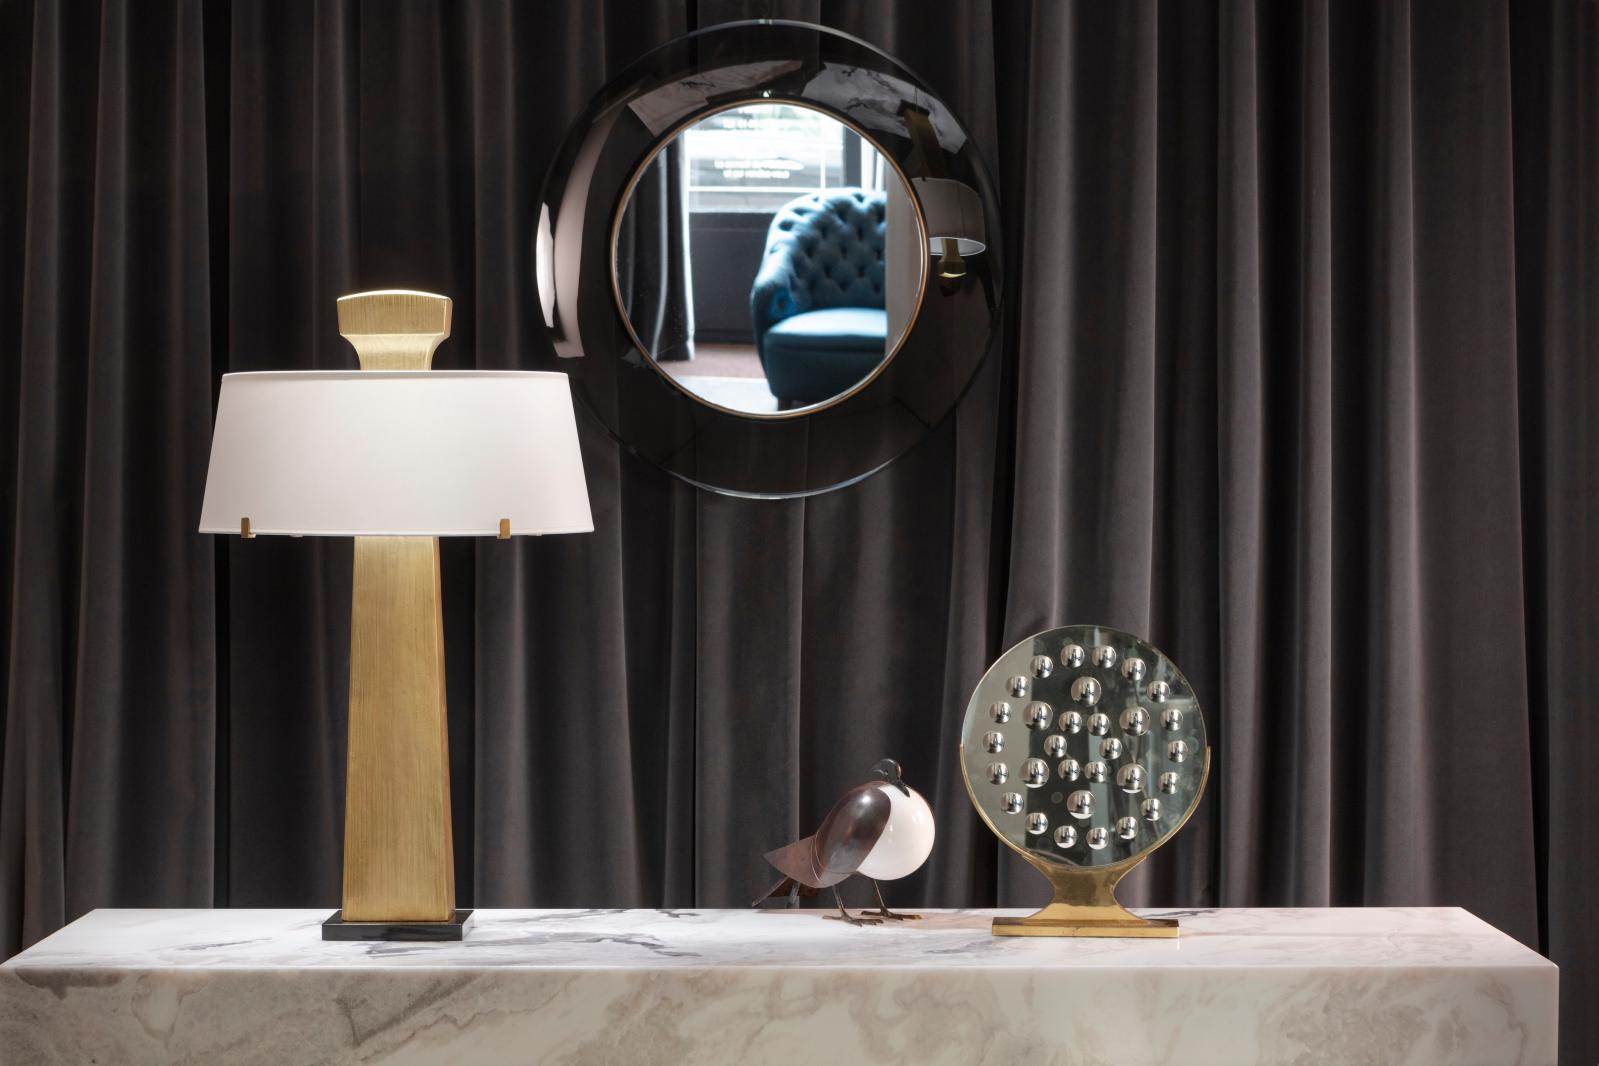 Lamp Patmos by Hervé Van der Straeten for Alexandre Biaggi, Lamp Pigeon by François-Xavcier Lalanne, two Fontana Arte mirrors.© CECIL MATH